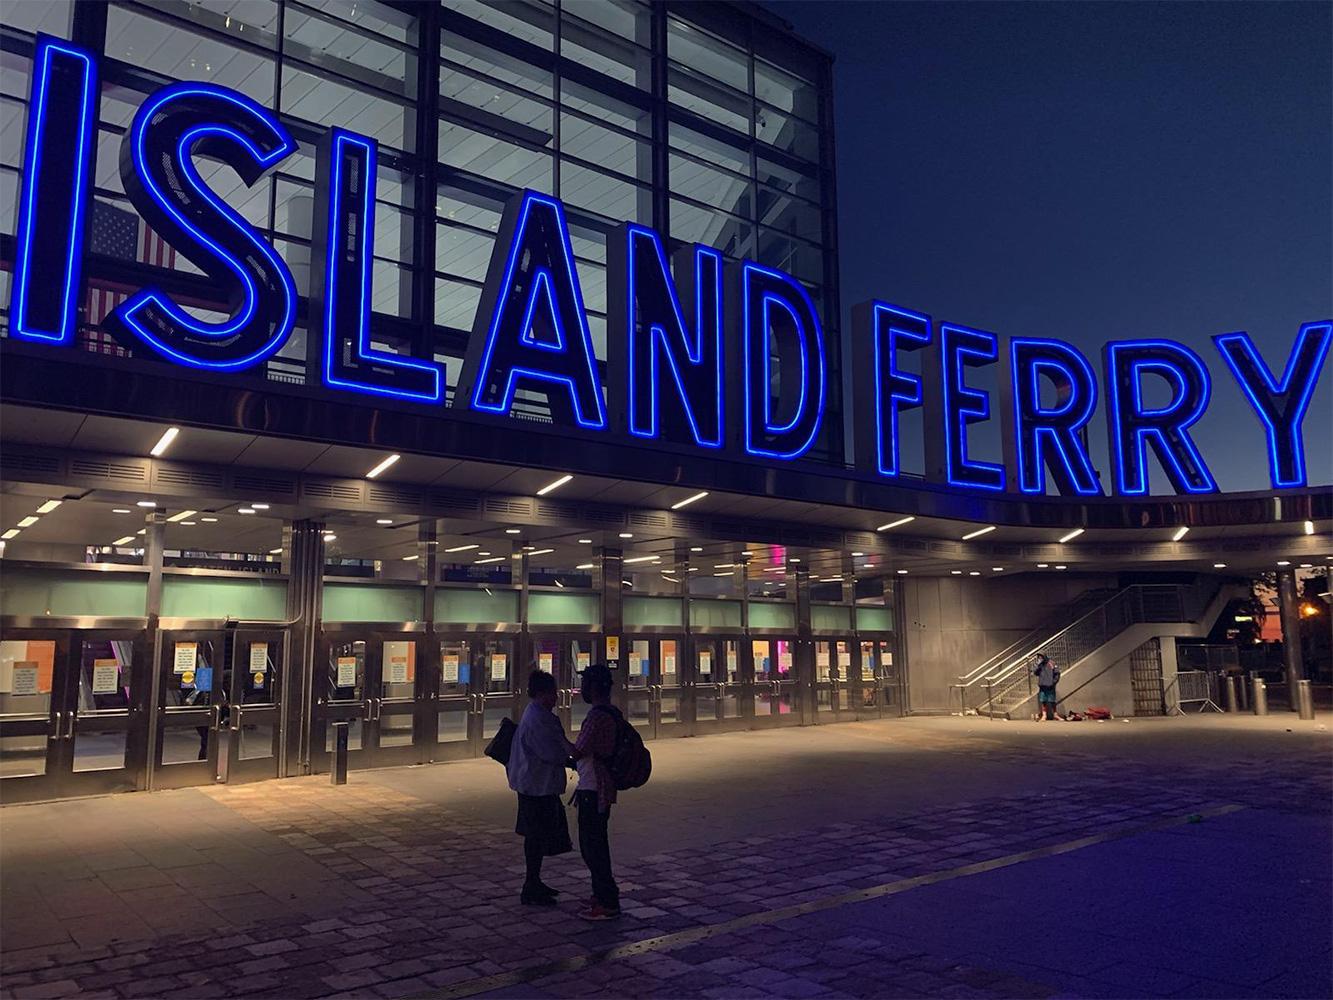 staten-island-ferry_1000px_1